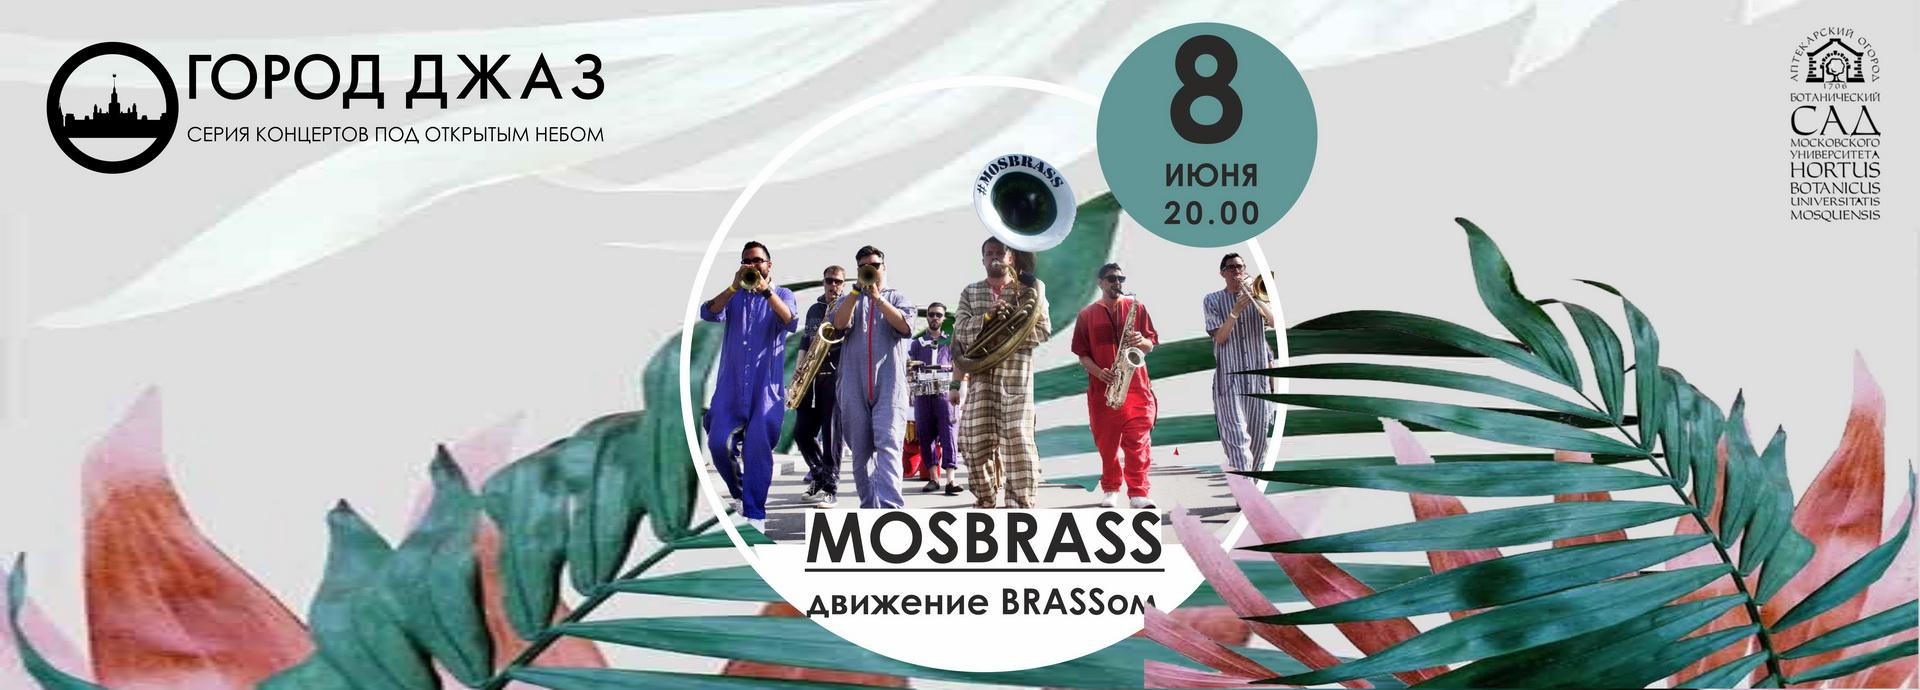 8 июня Мосбрас